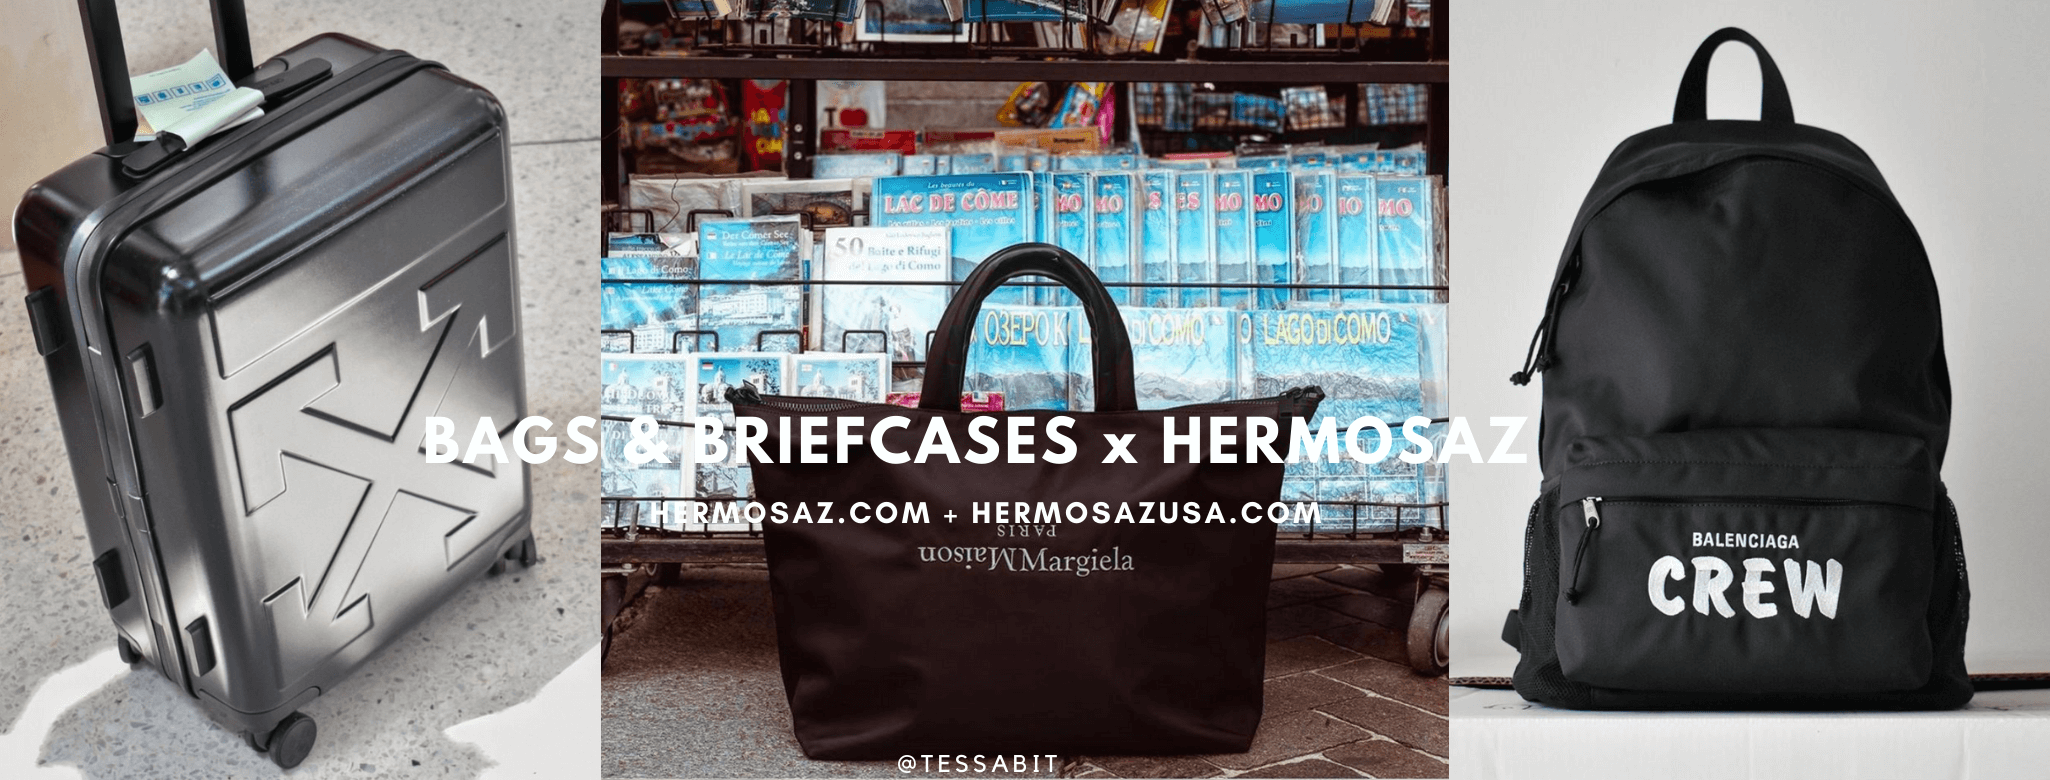 Bags & Briefcases x Hermosaz